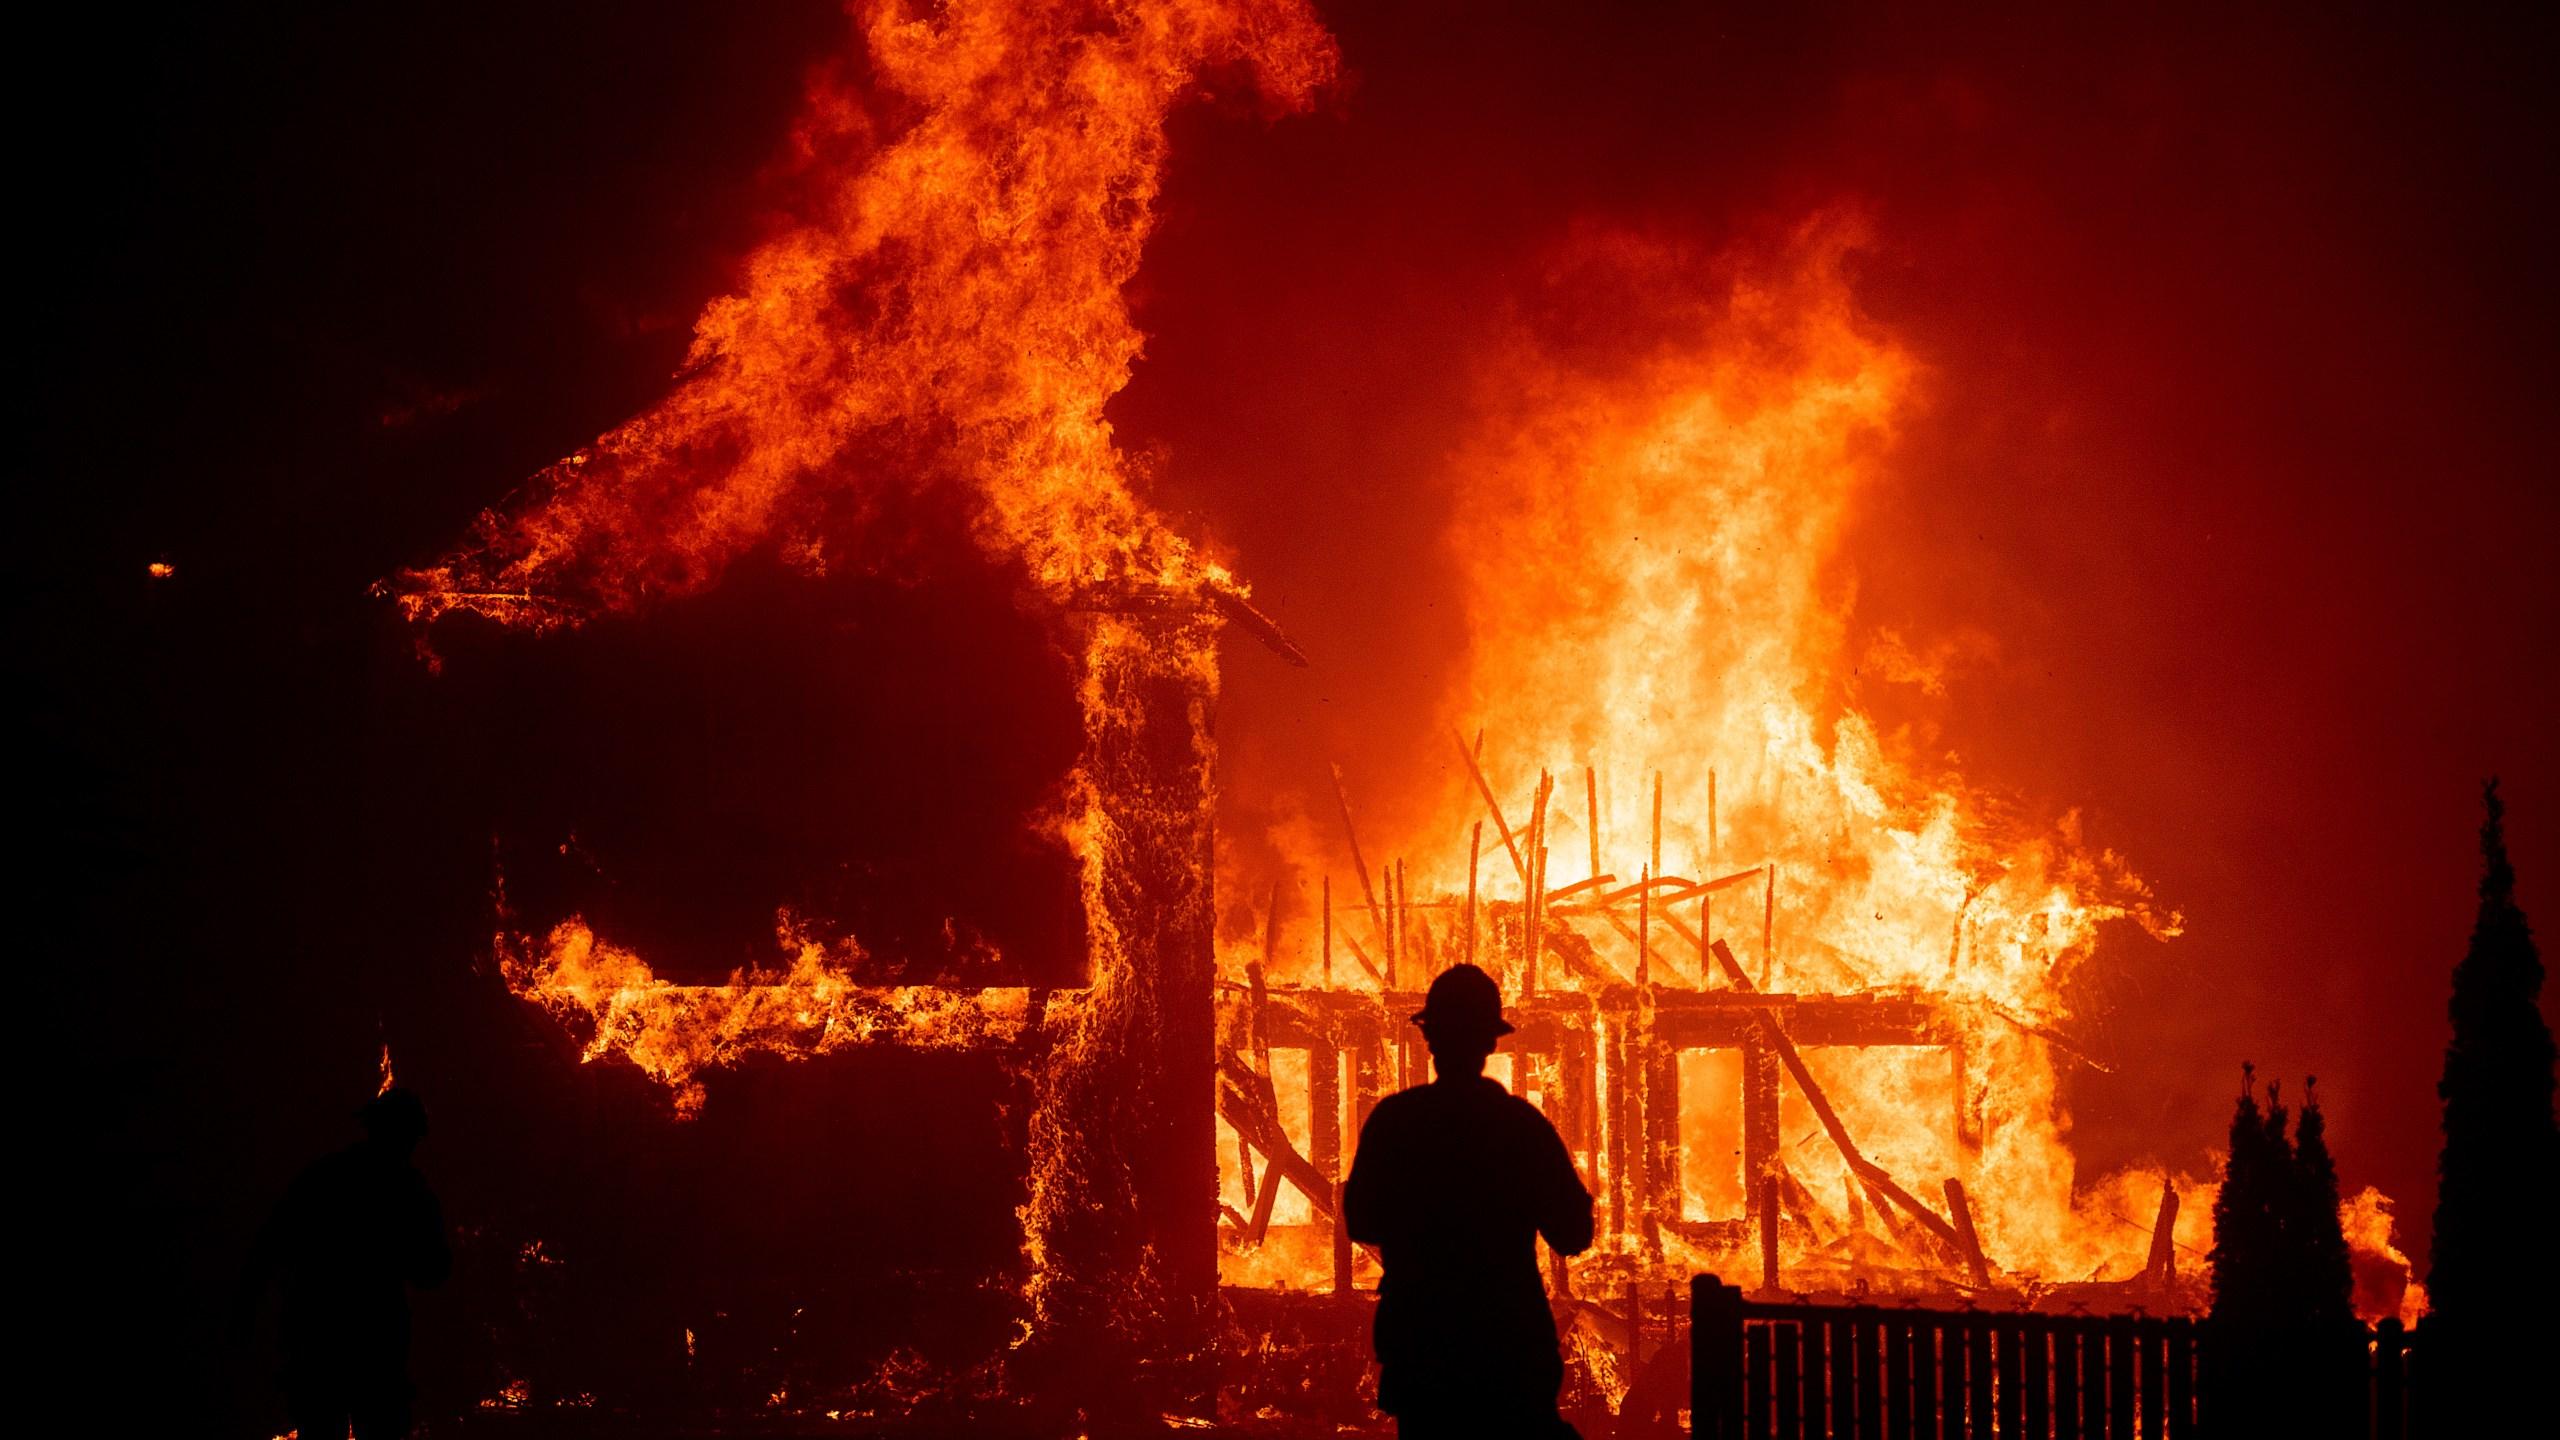 Northern_California_Wildfire_82280-159532.jpg18520598